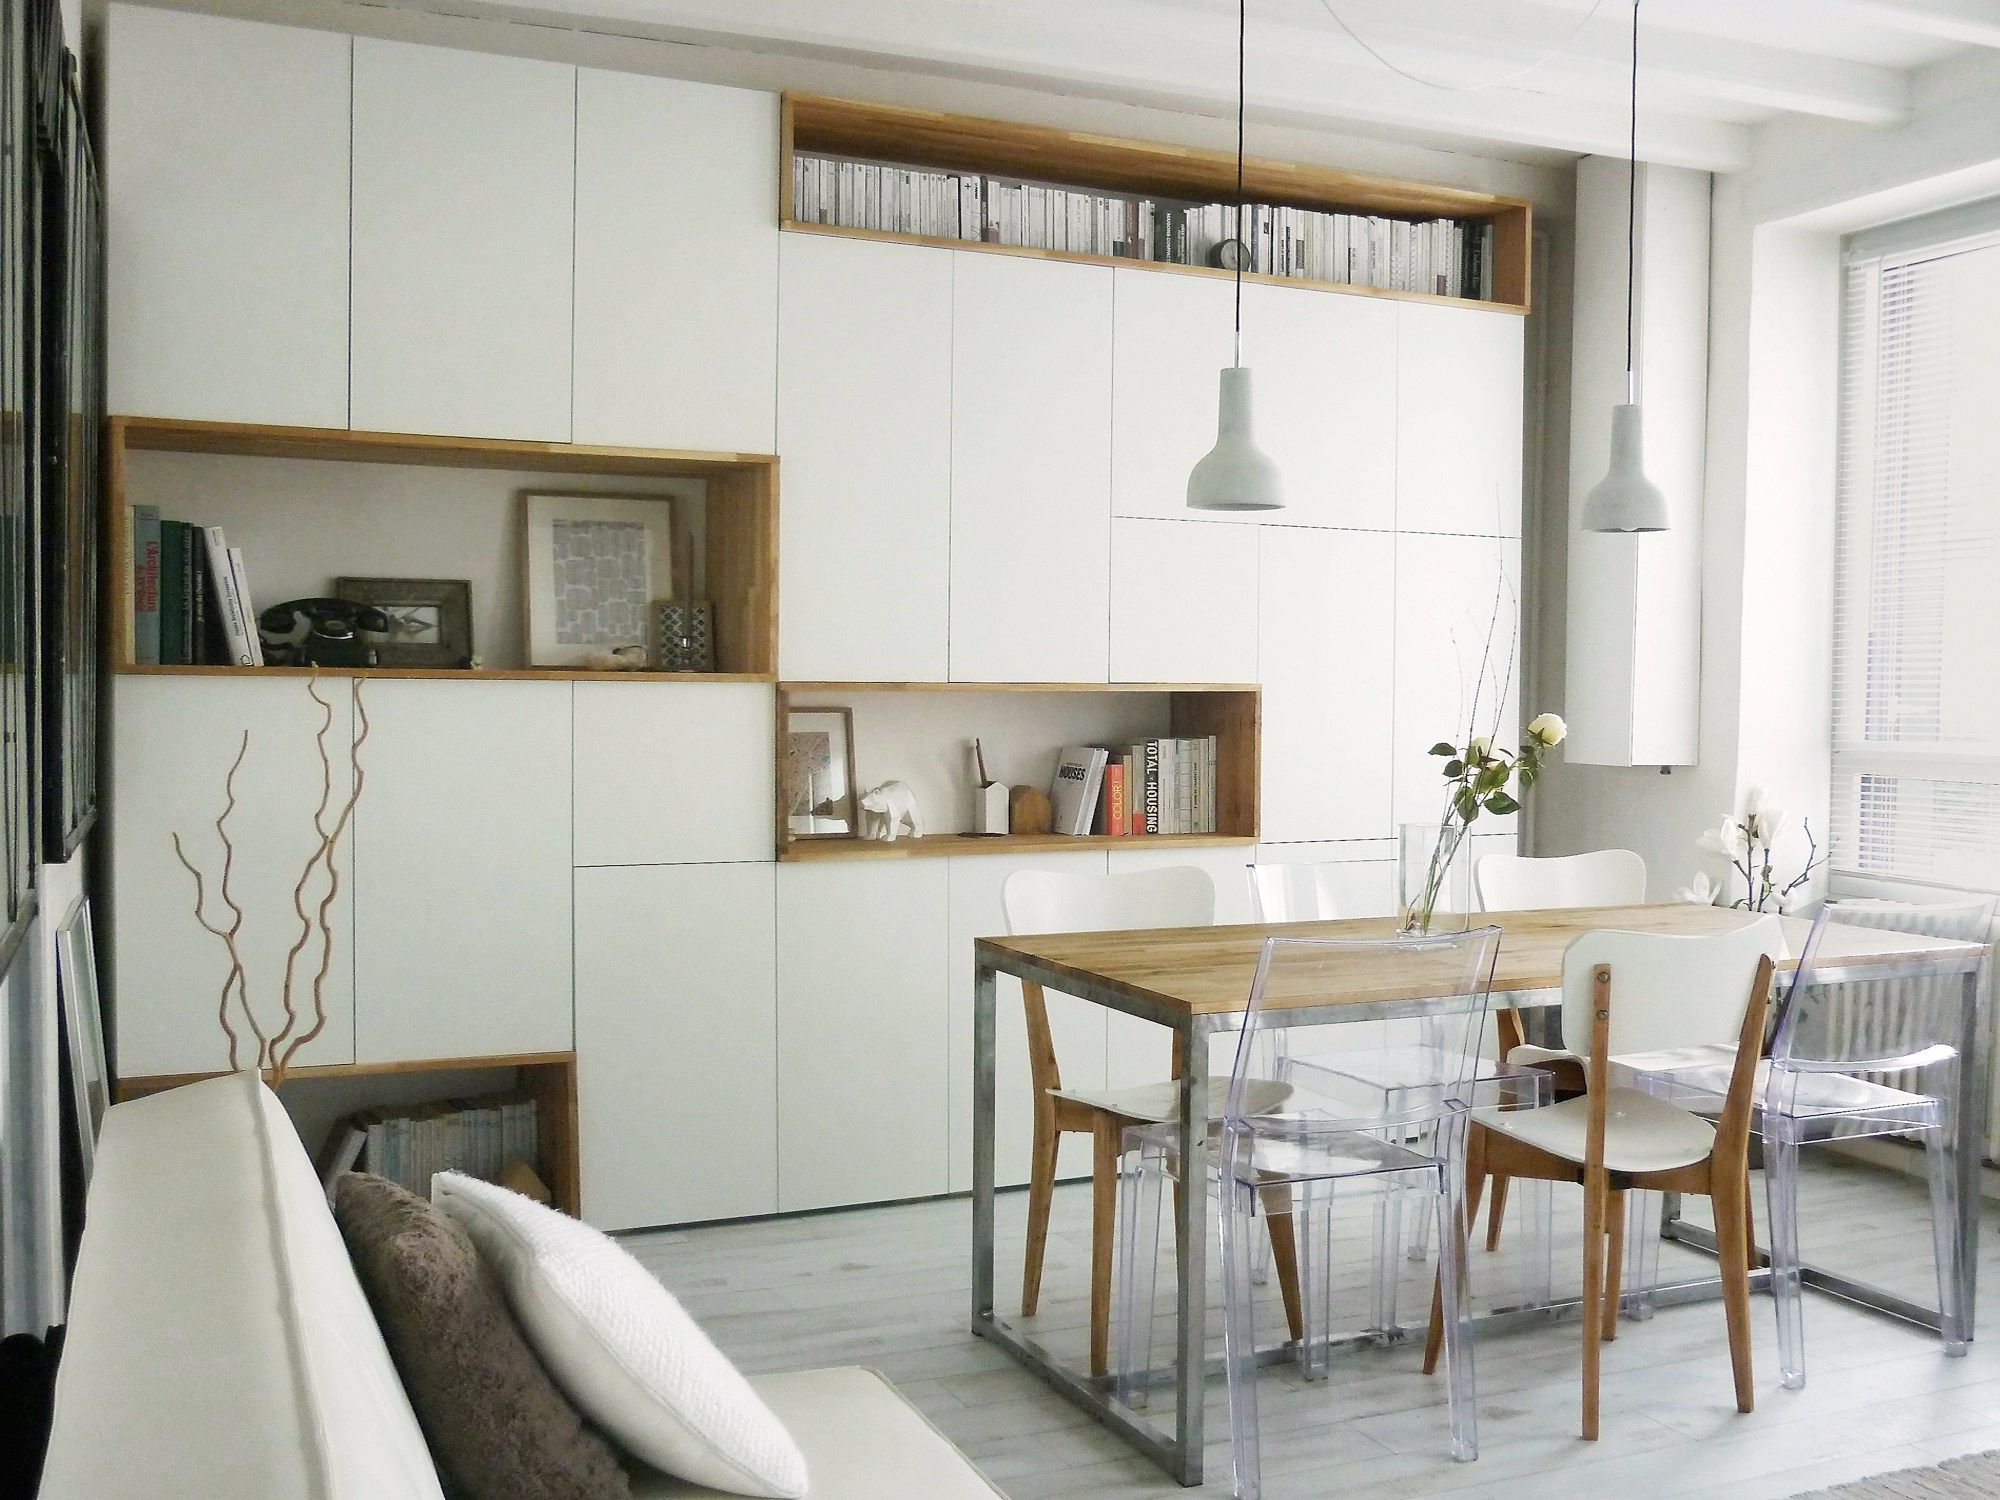 Mur De Rangement Salon mur rangements blanc bois scandinave | meuble salle à manger